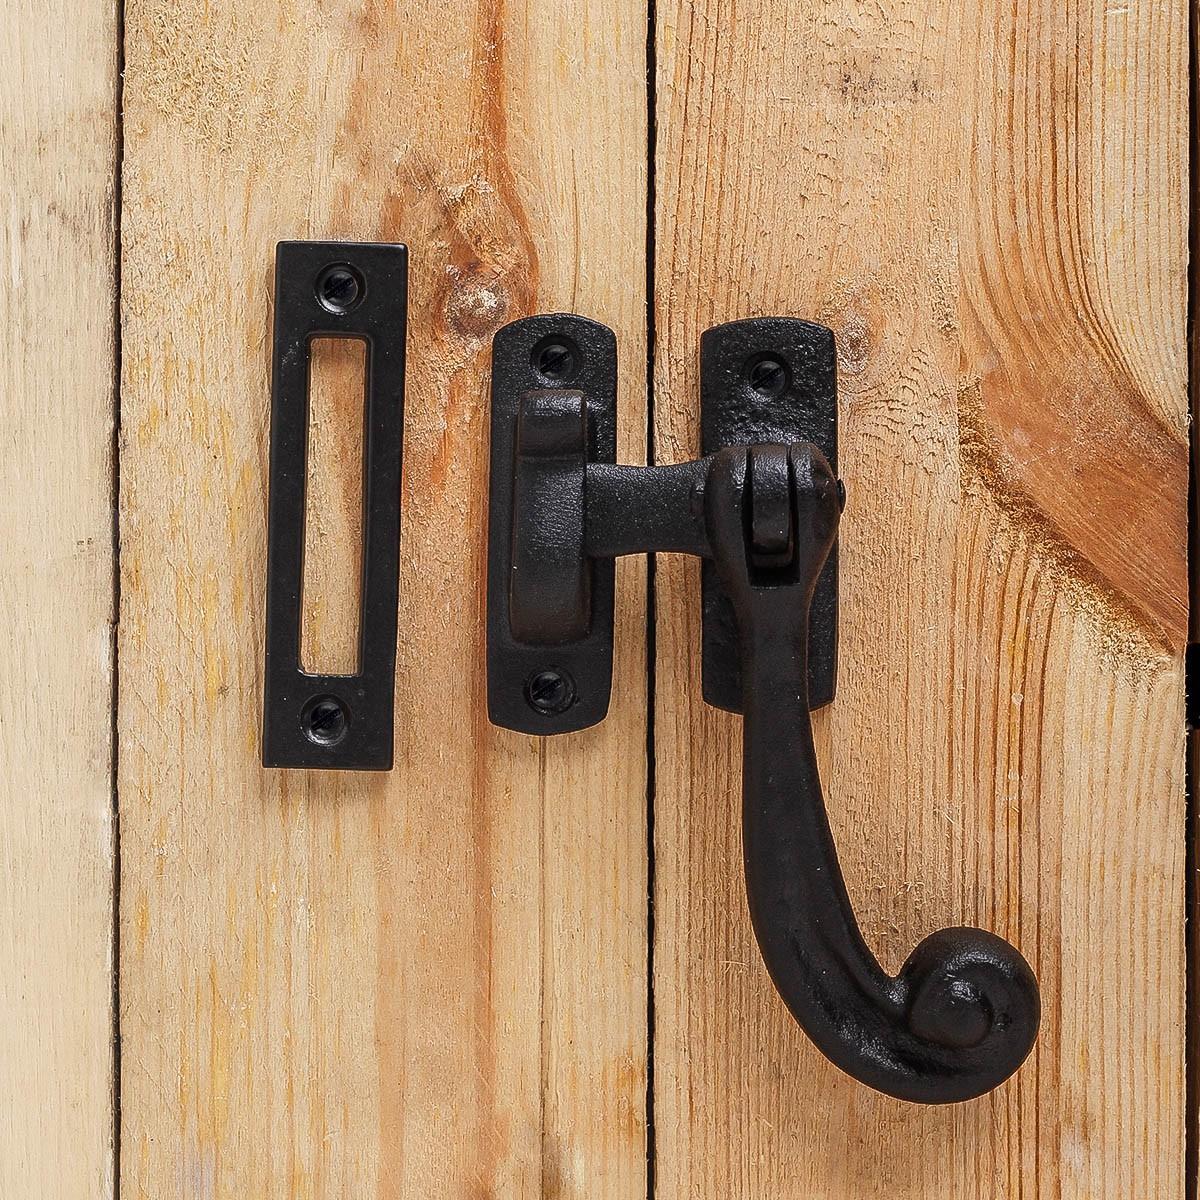 Sash Window Door Lock Black Wrought Iron 4 12 Pack of 12 Window Pulls Window Lifts Sash Lift